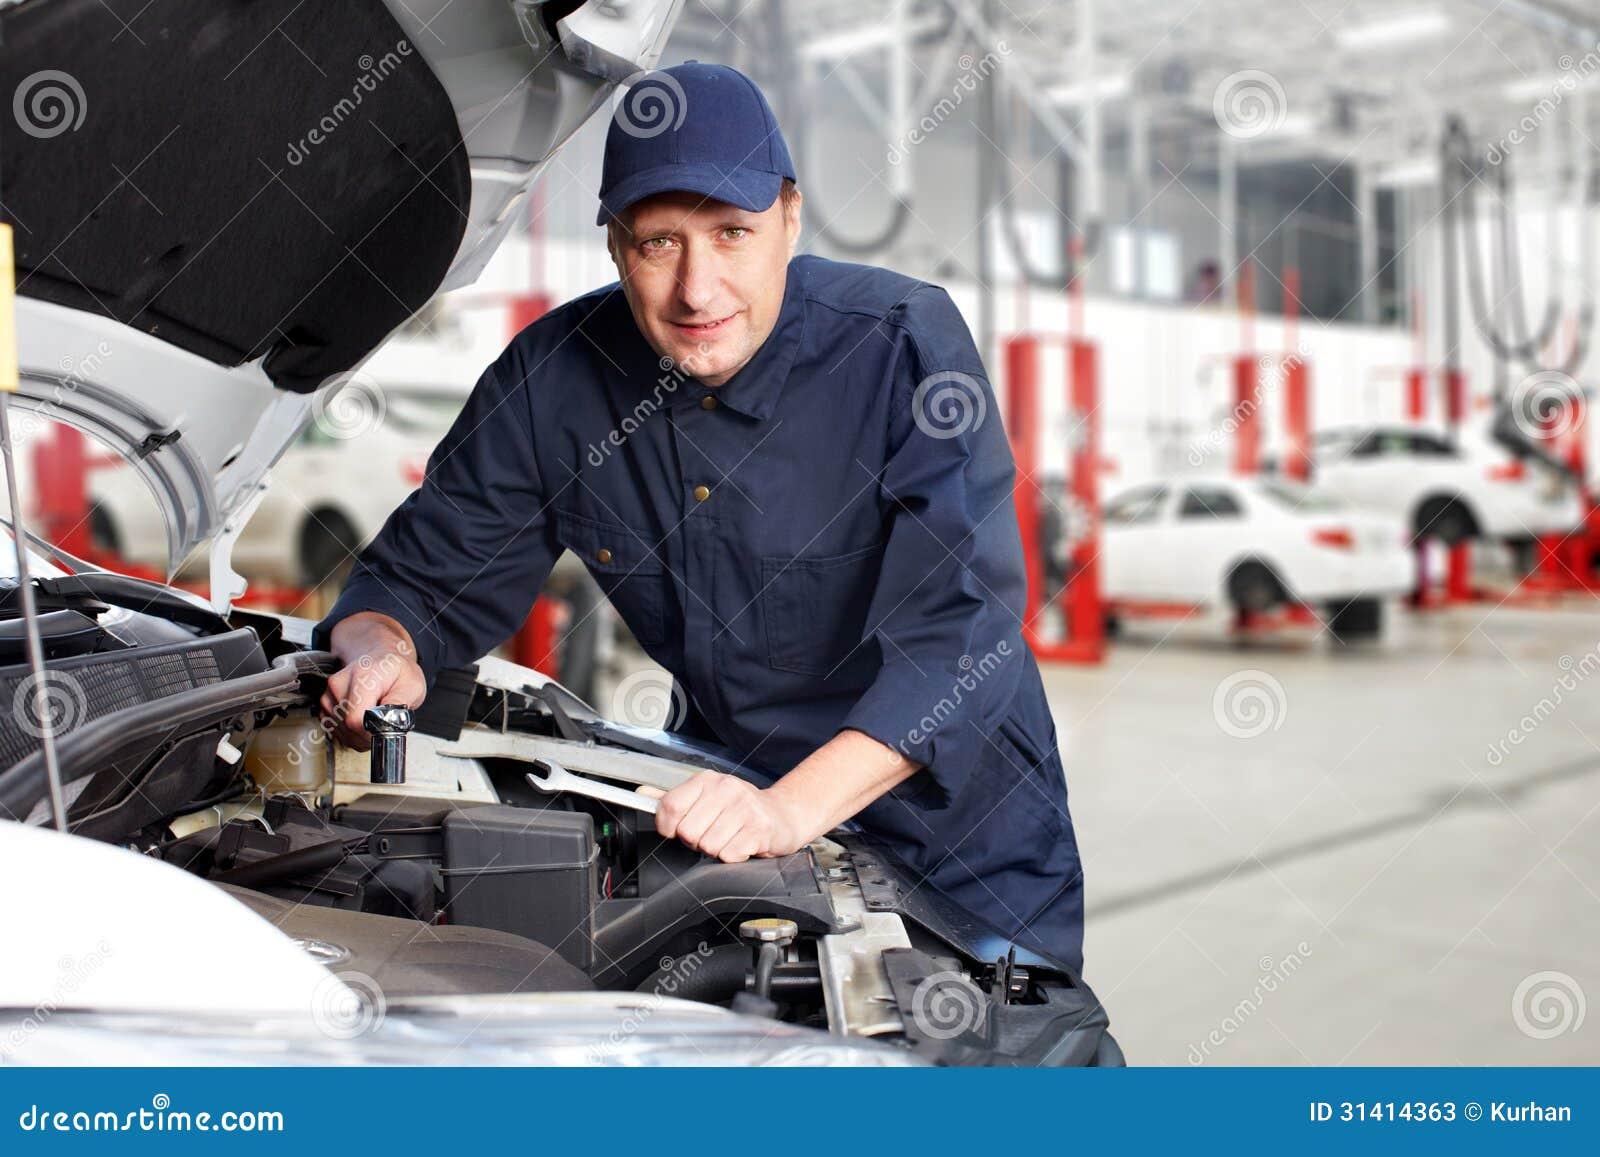 Professionele autowerktuigkundige.